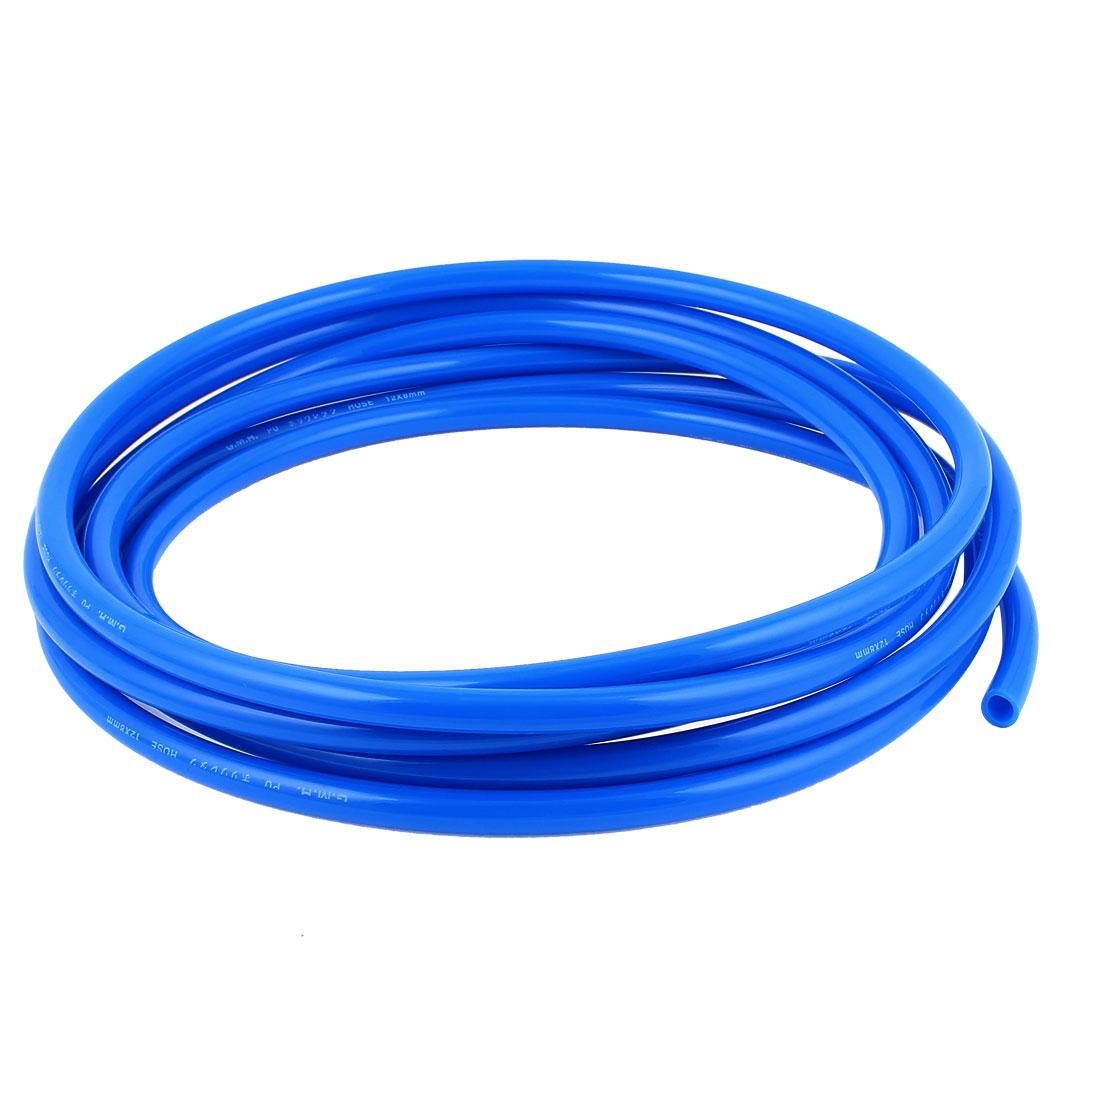 12mm x 8mm Fleaxible PU Tube Pneumatic Hose Blue 5M Length